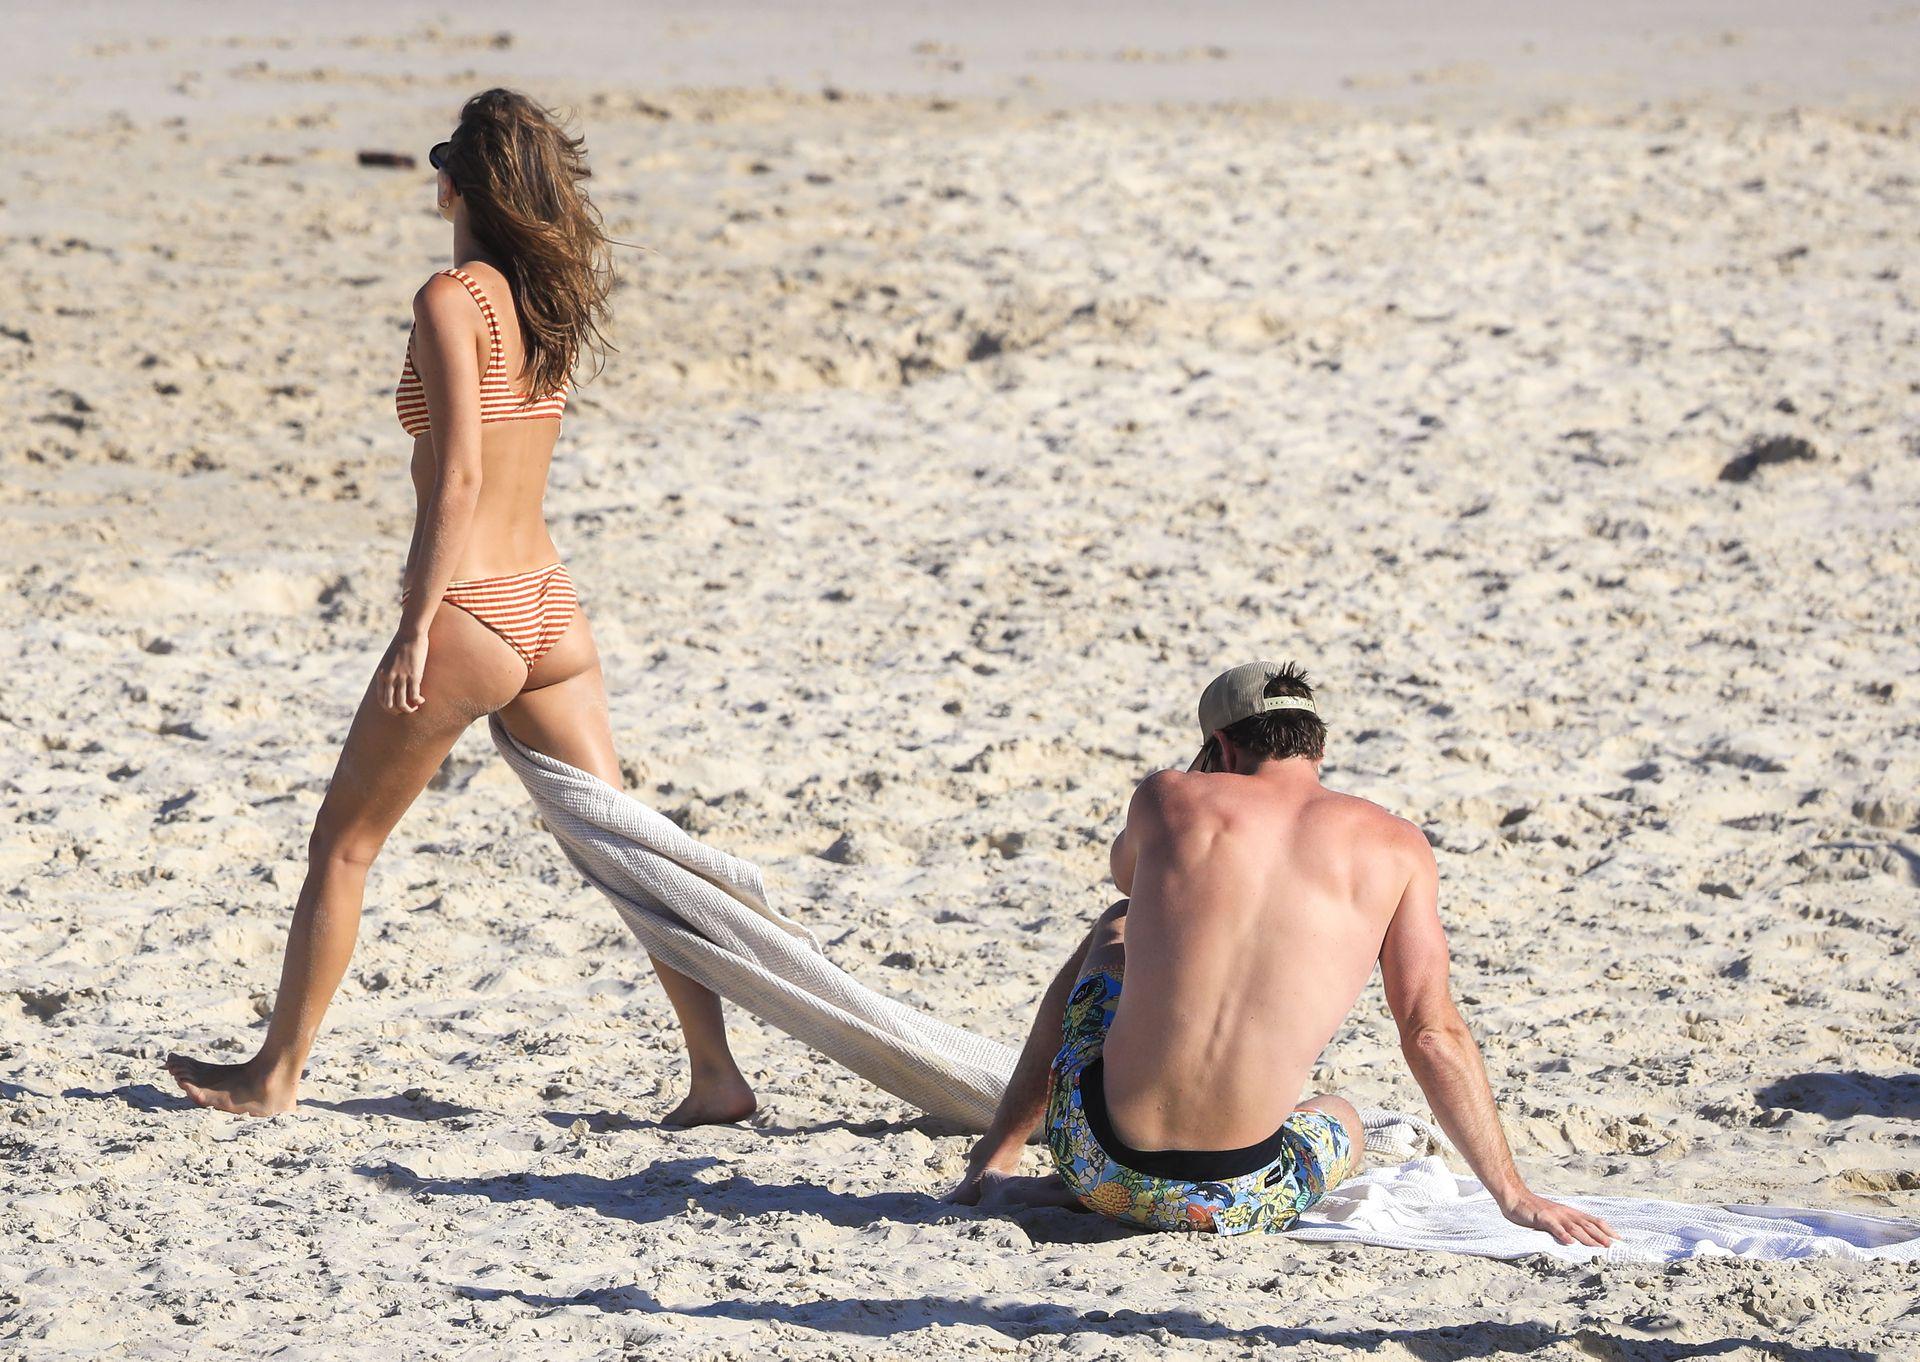 Gabriella Brooks Hot – Liam Hemsworth's New Girlfriend 0050